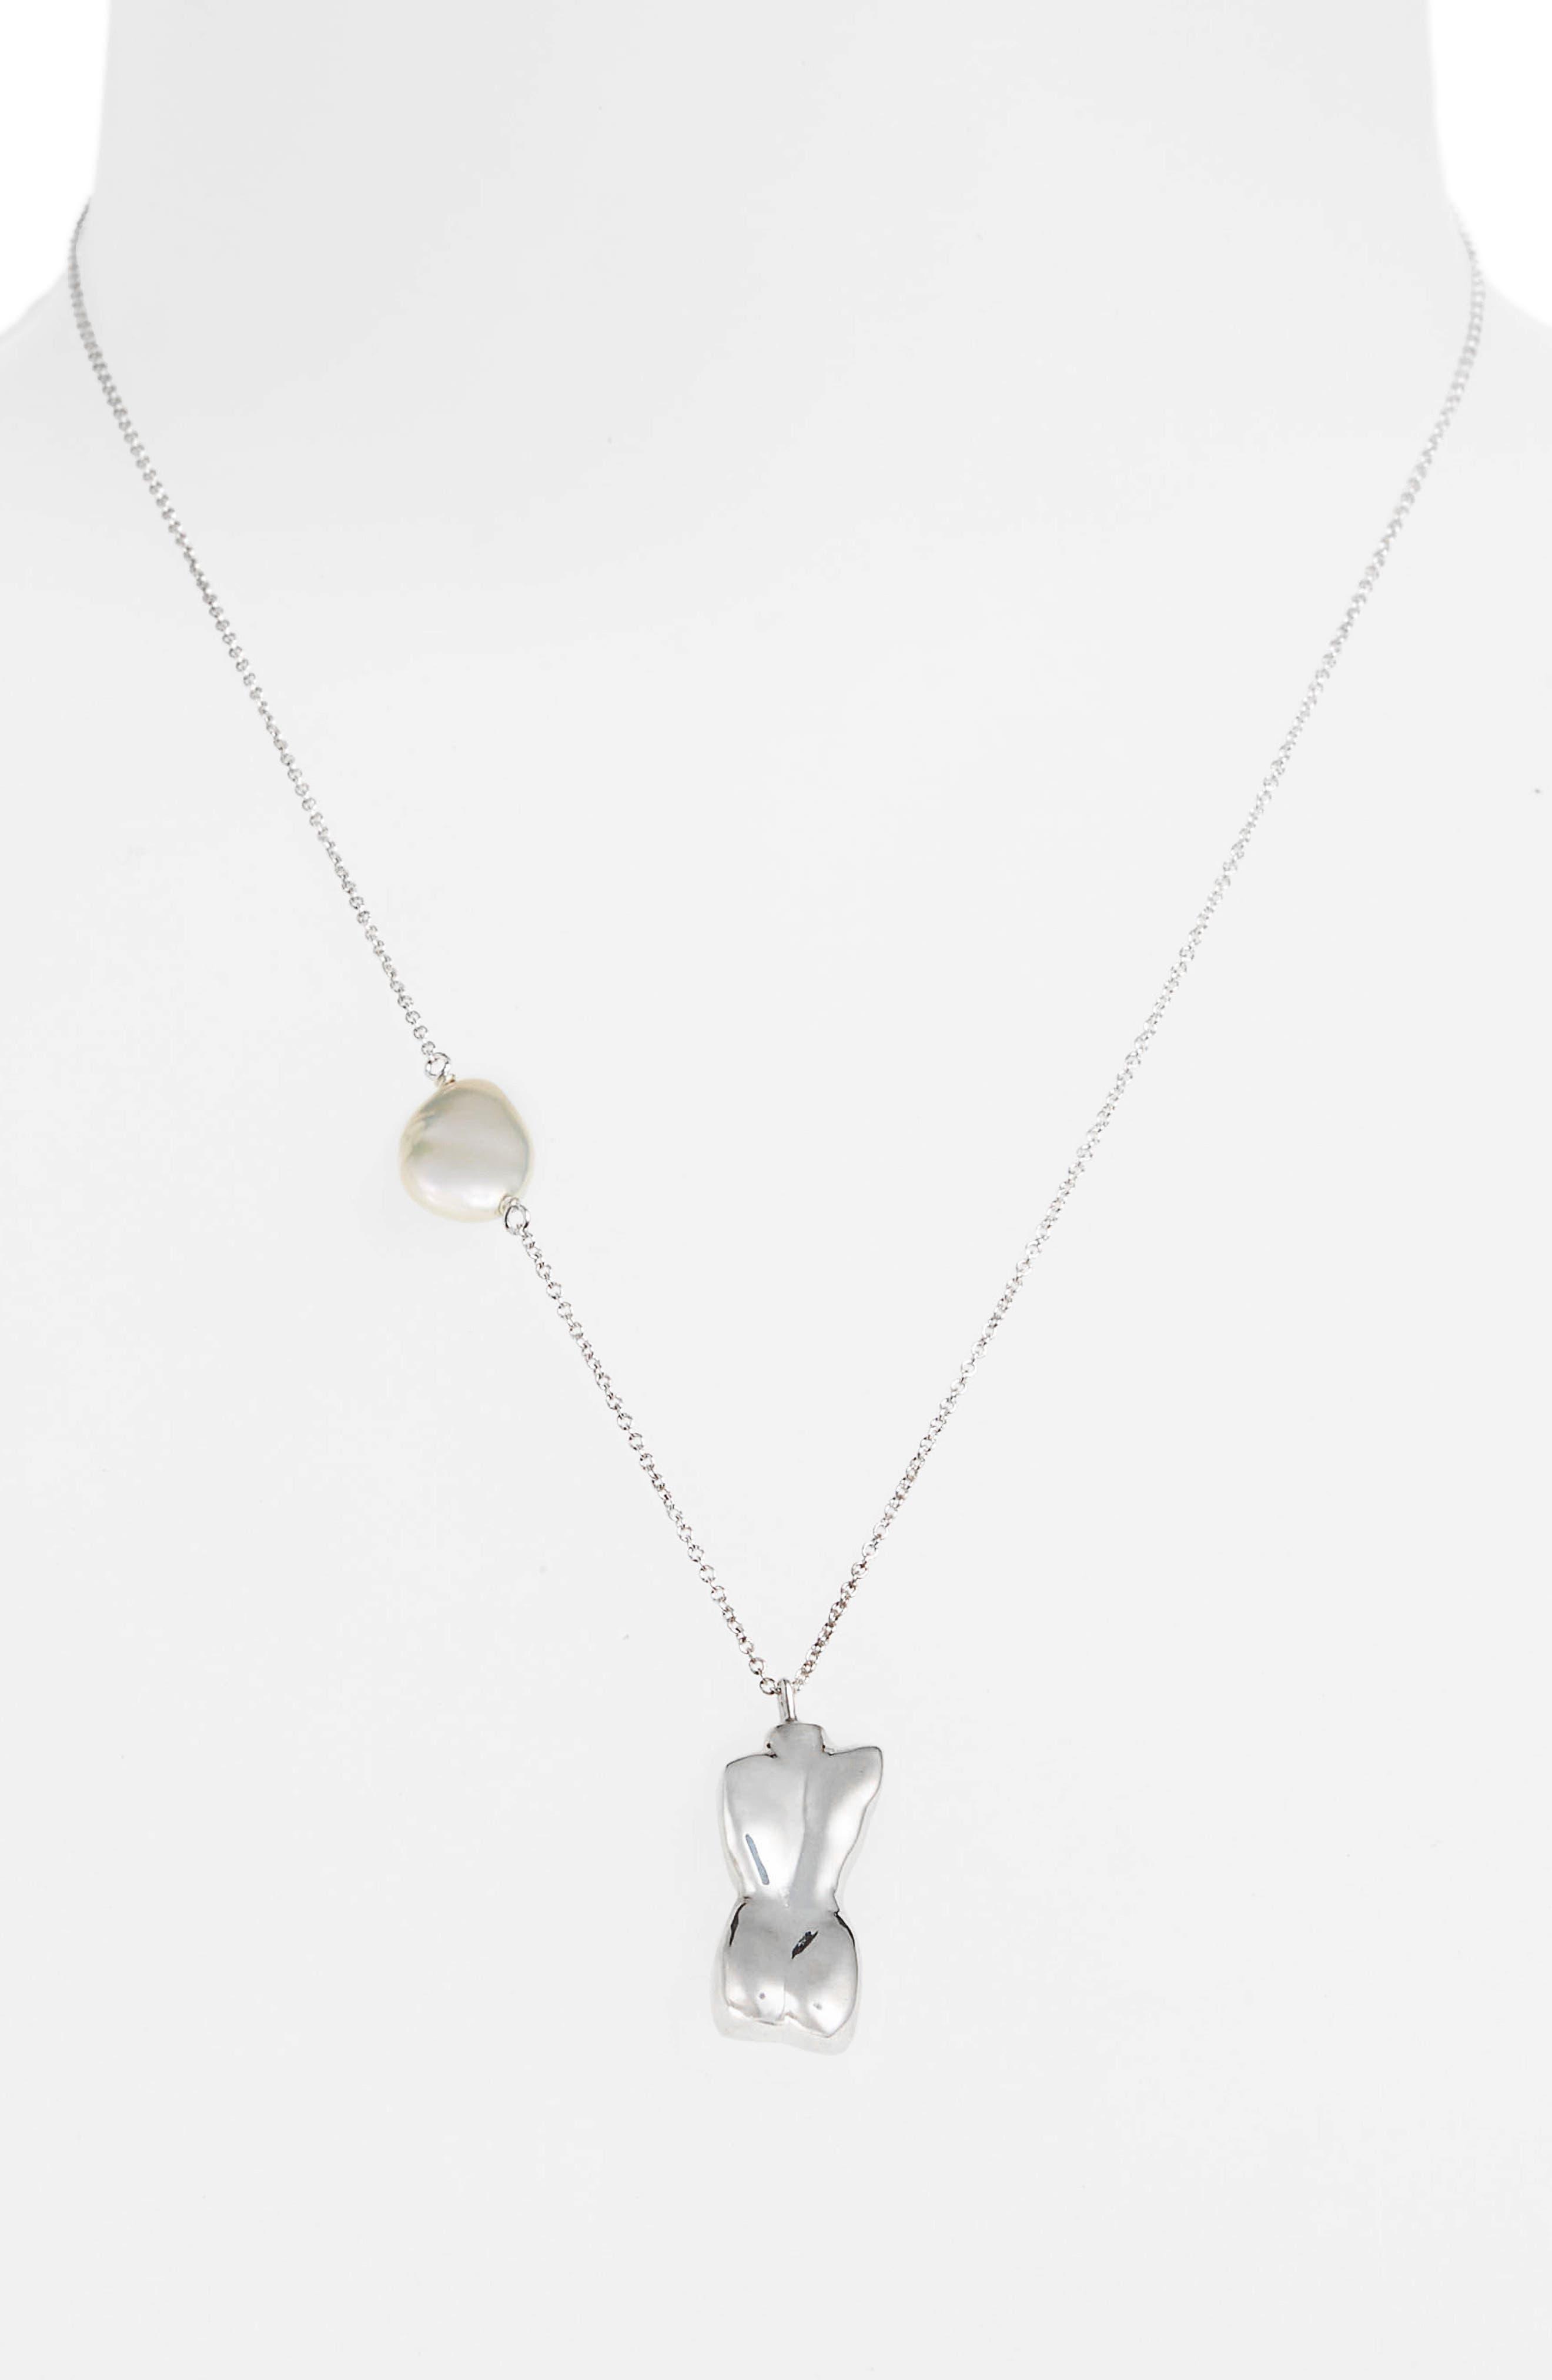 Bod Pendant Necklace,                             Alternate thumbnail 3, color,                             Sterling Silver/ White Keshi